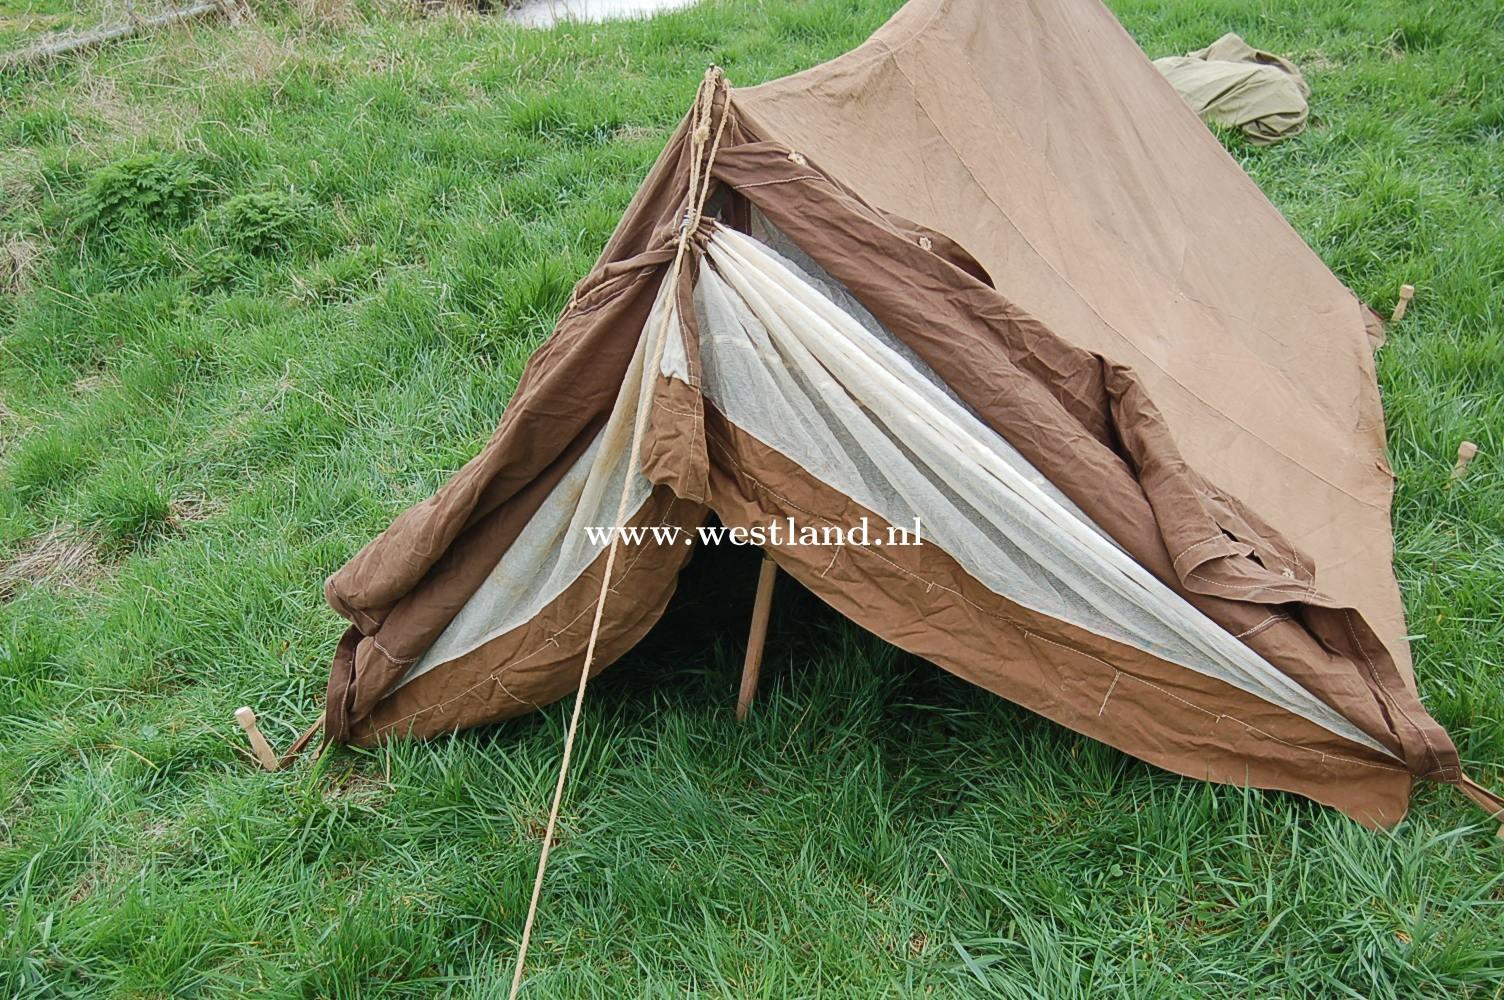 WWII Britis 2 people Bivak tent